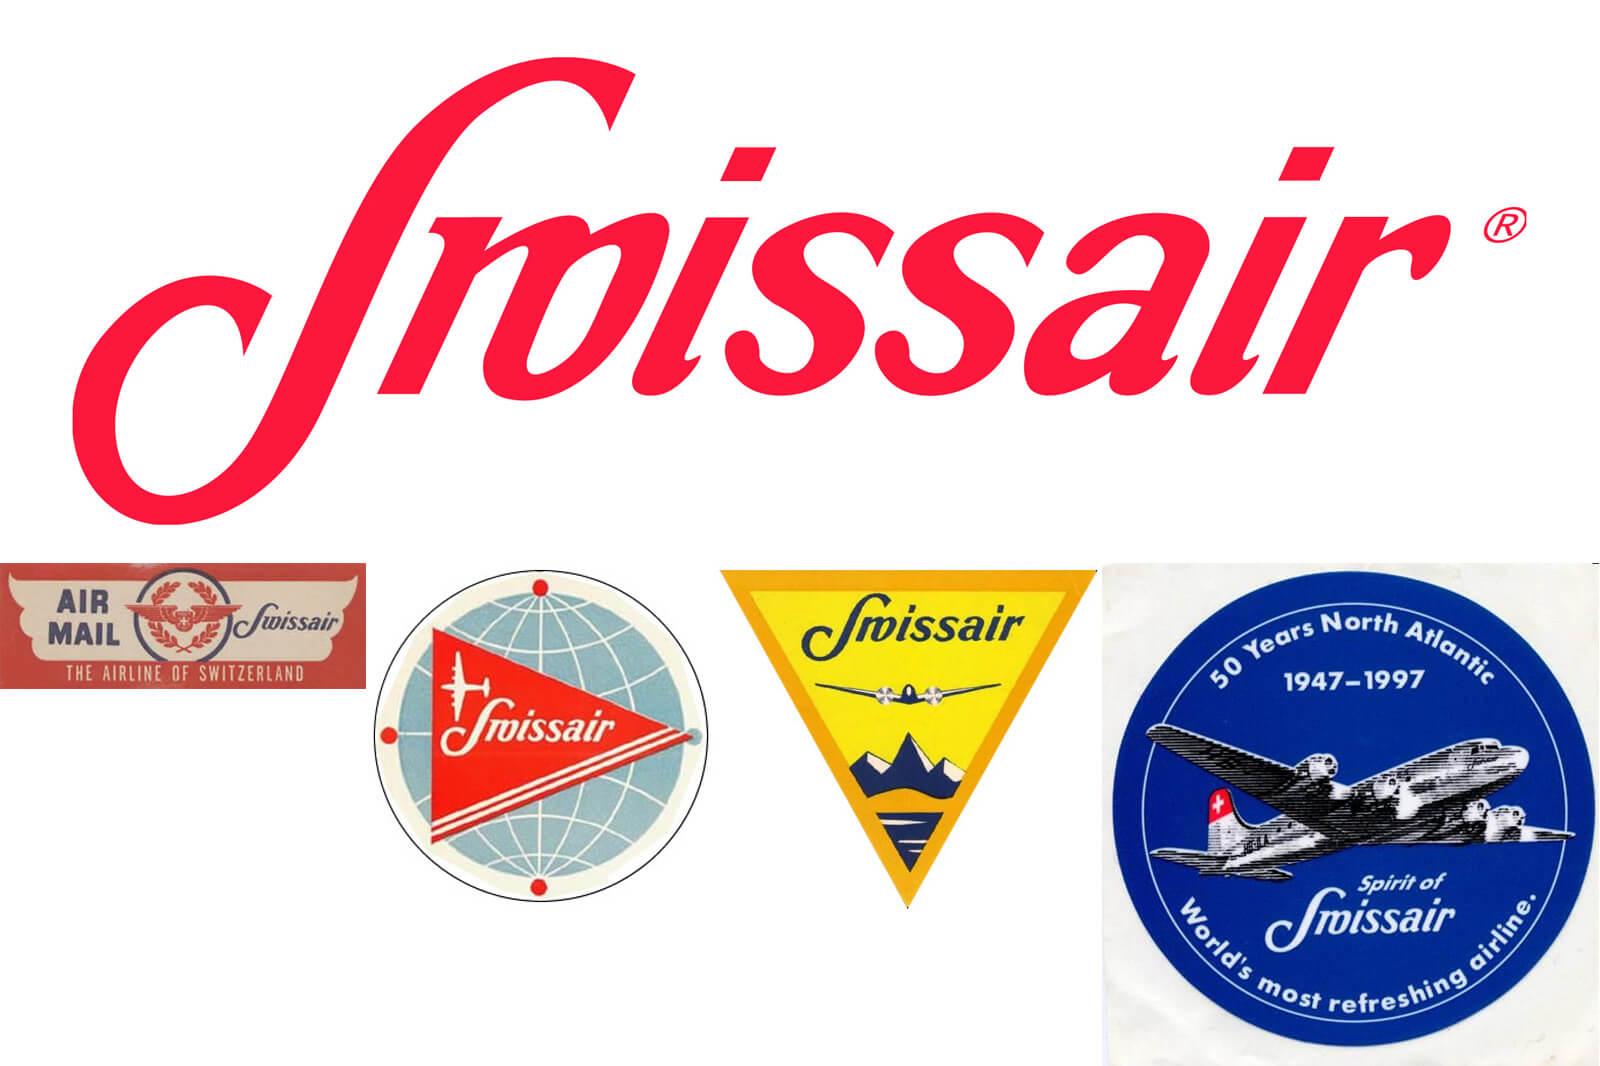 Swissair Posters and Logos - 1940s Swissair Logos